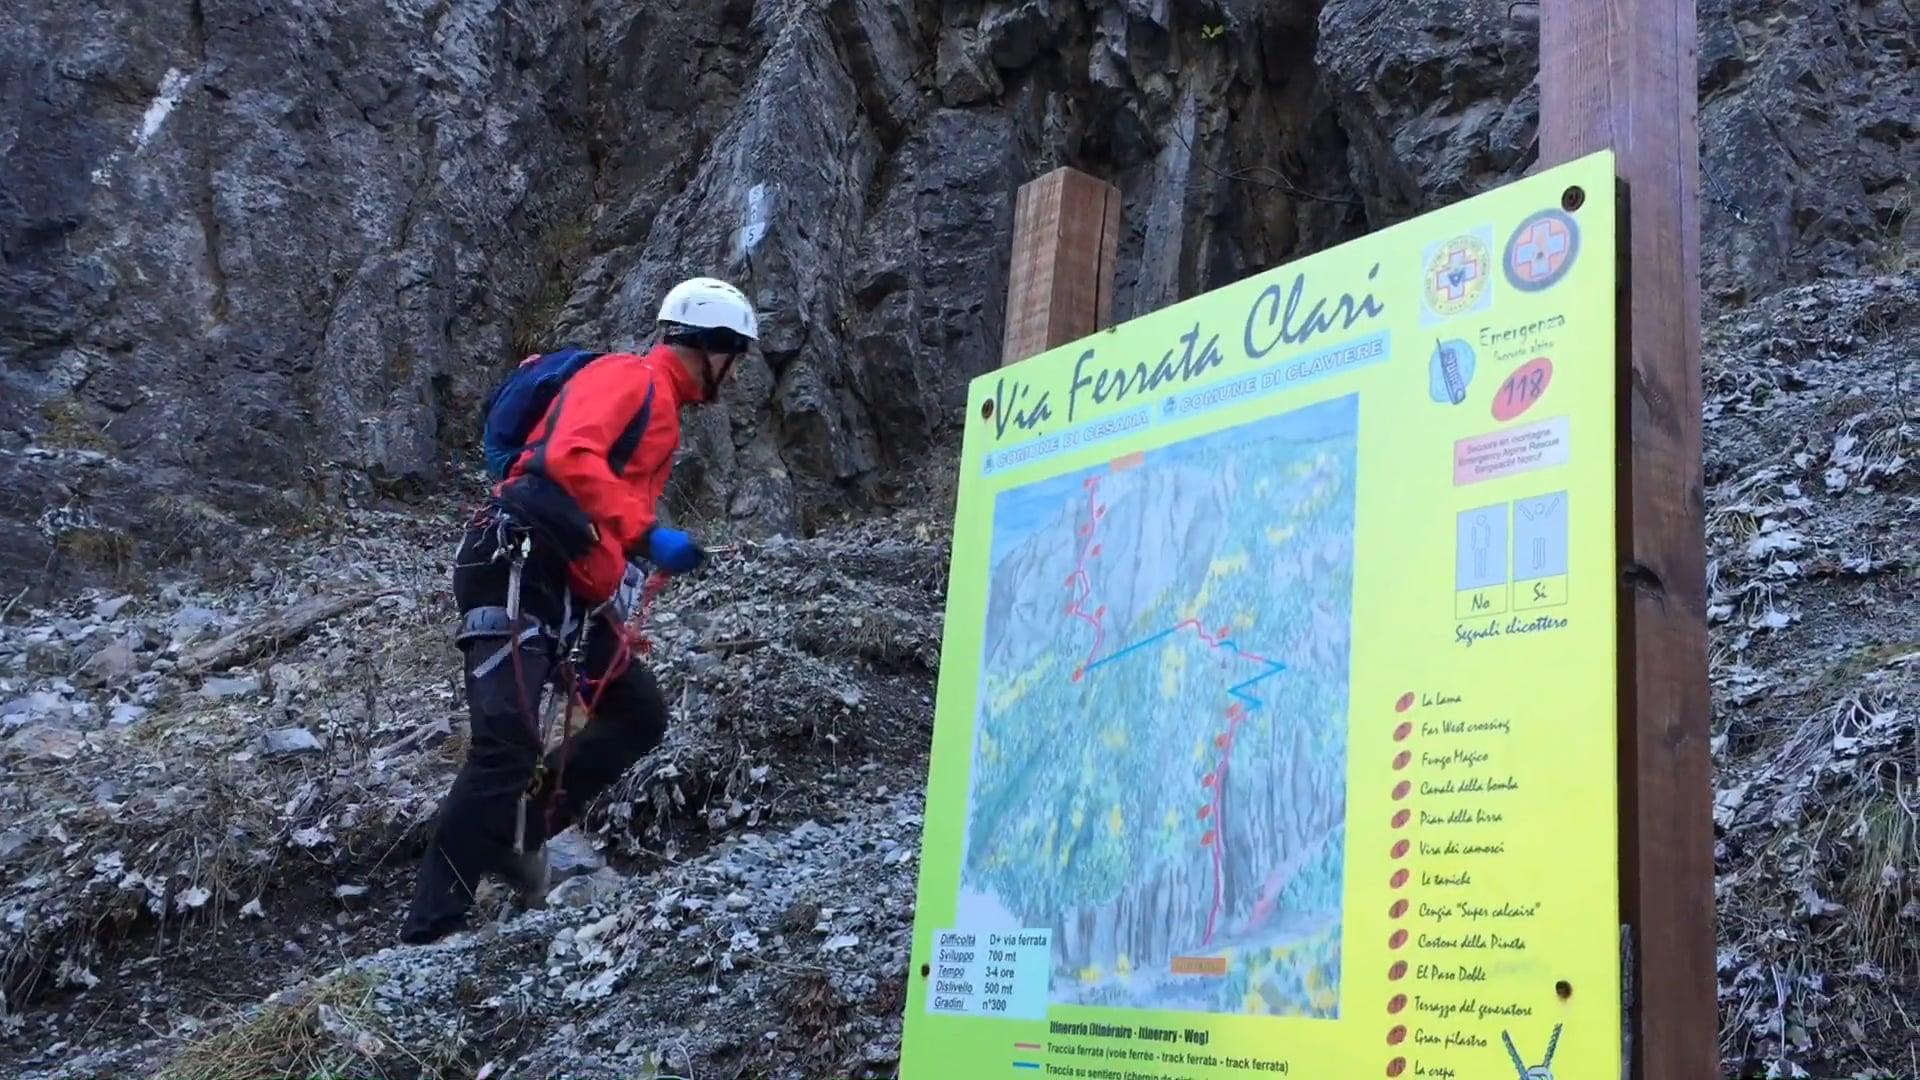 Ferrata Clari - Claviere - Gorge di San Gervasio